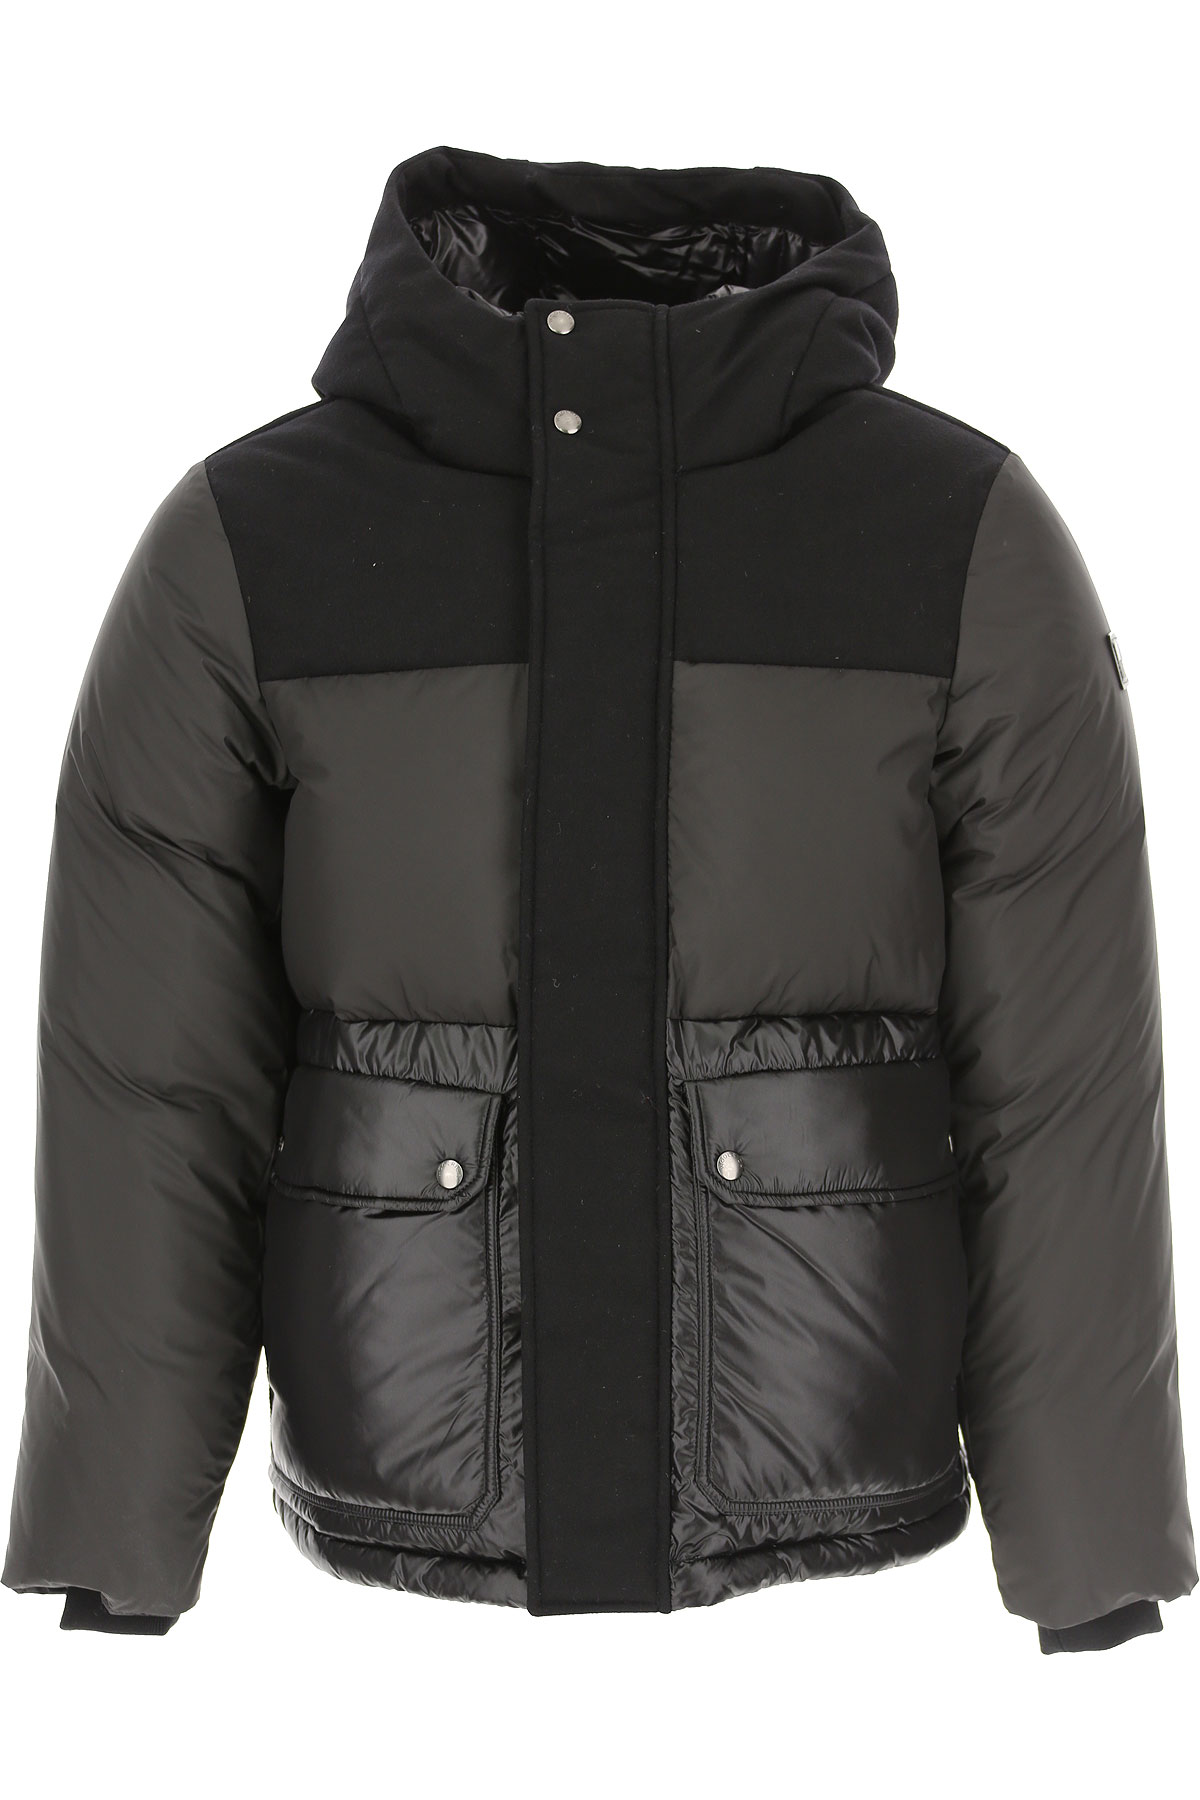 Woolrich Down Jacket for Men, Puffer Ski Jacket, Black, polyamide, 2019, L M S XS